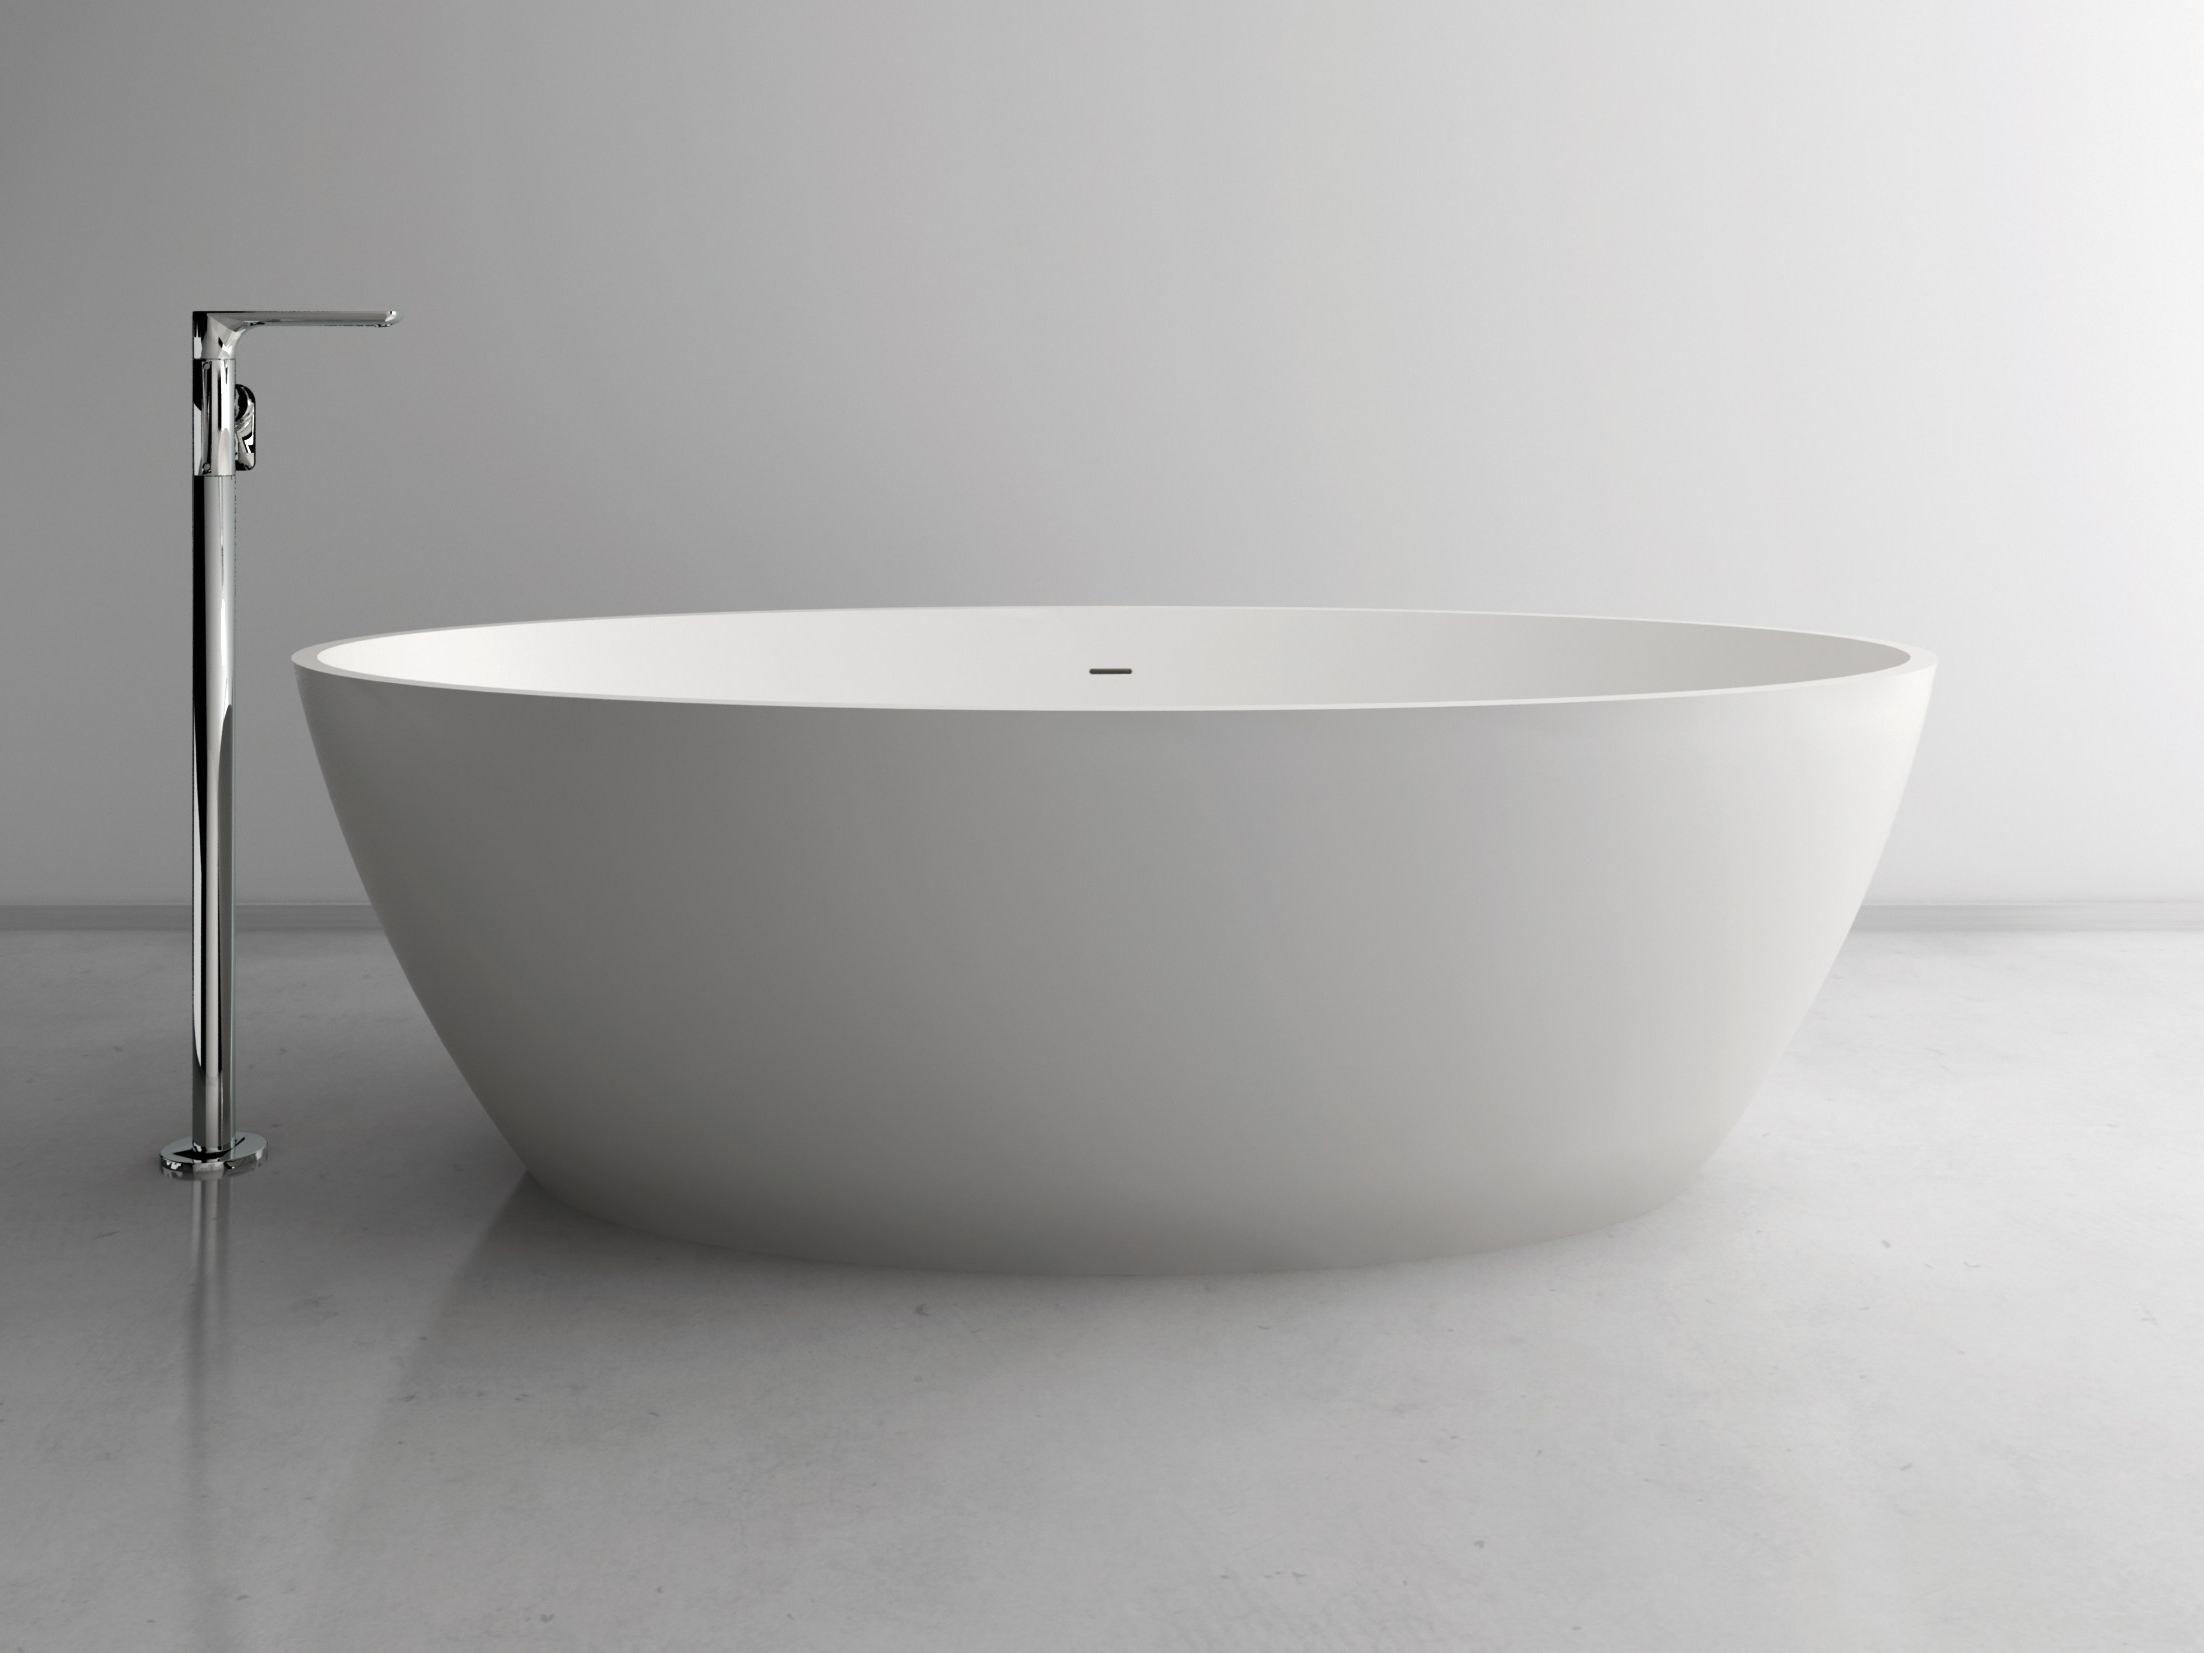 Vasca da bagno ovale ou by inbani design inbani - Vasca da bagno ovale ...